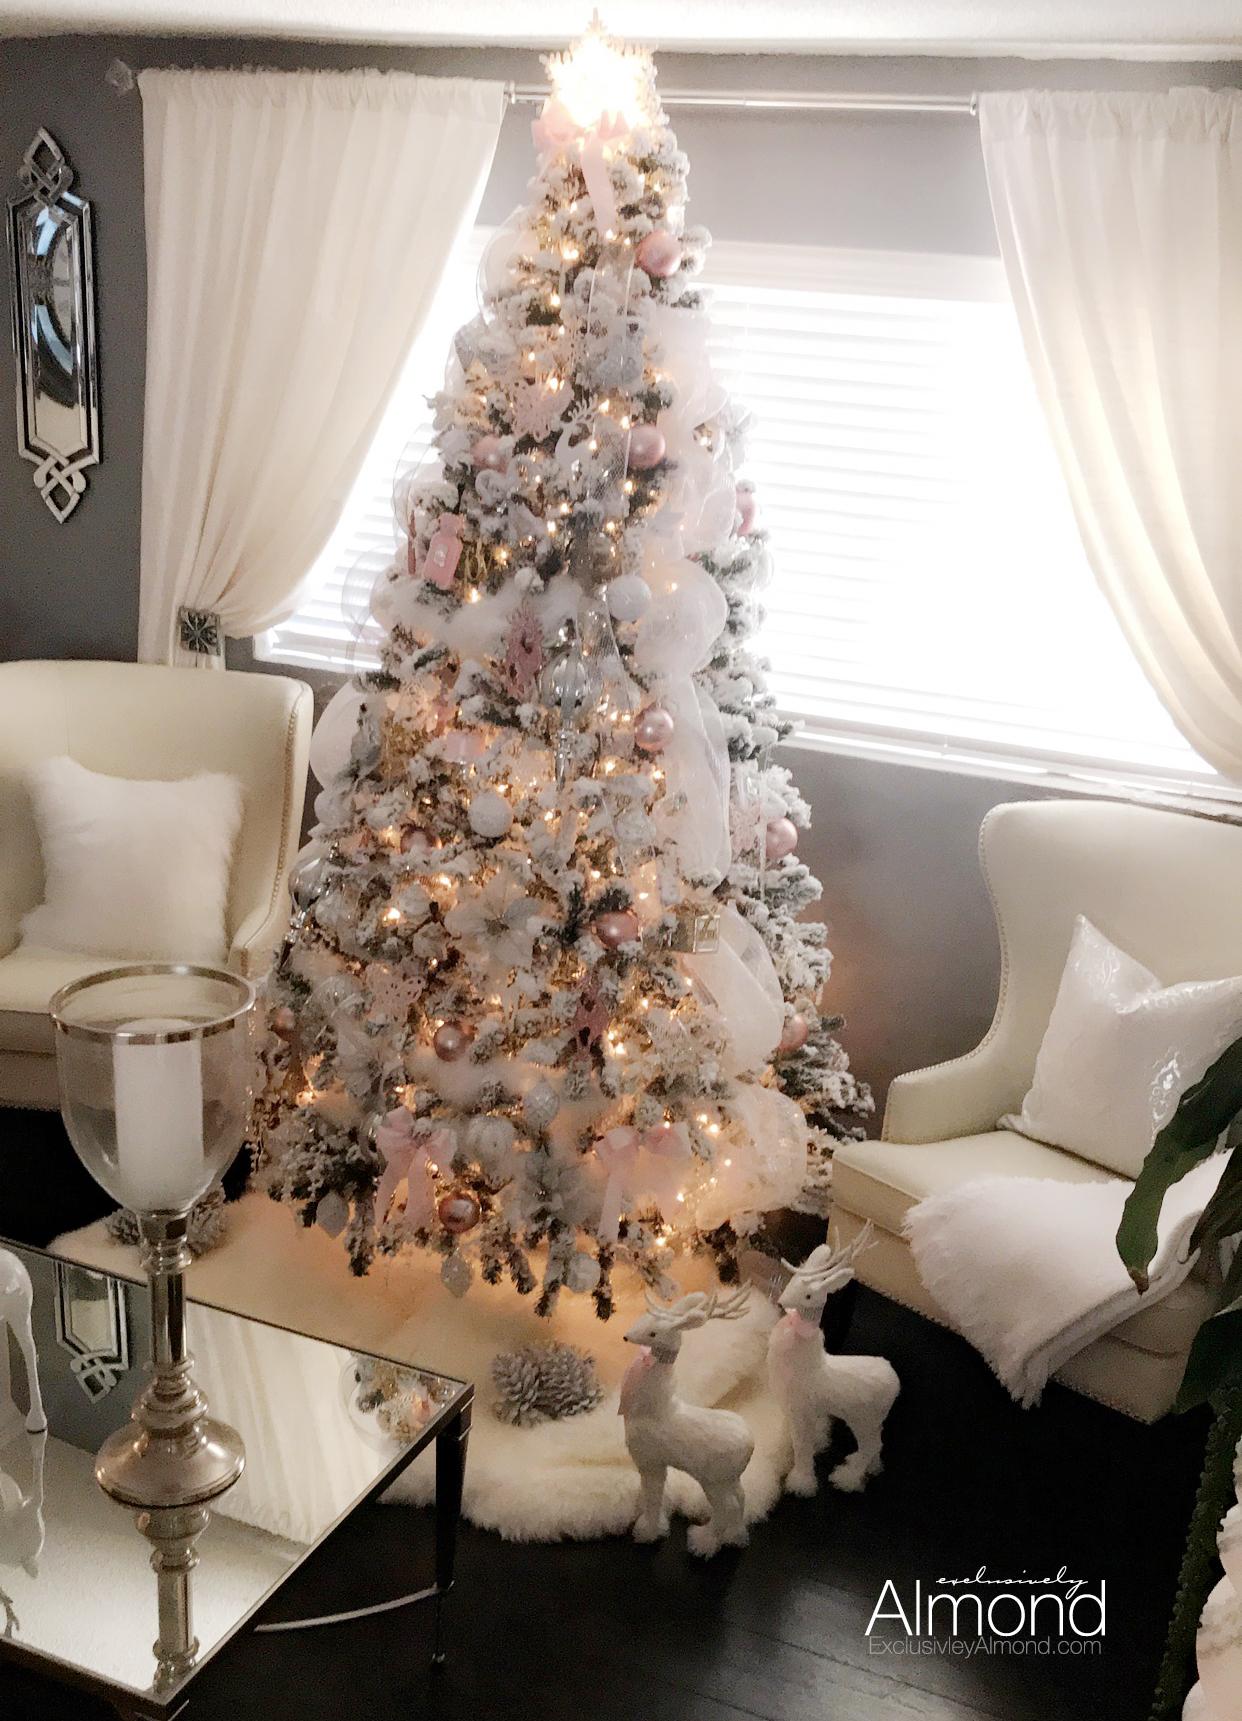 Blush pink Christmas tree decorations Christmas Decorating ideas 2017